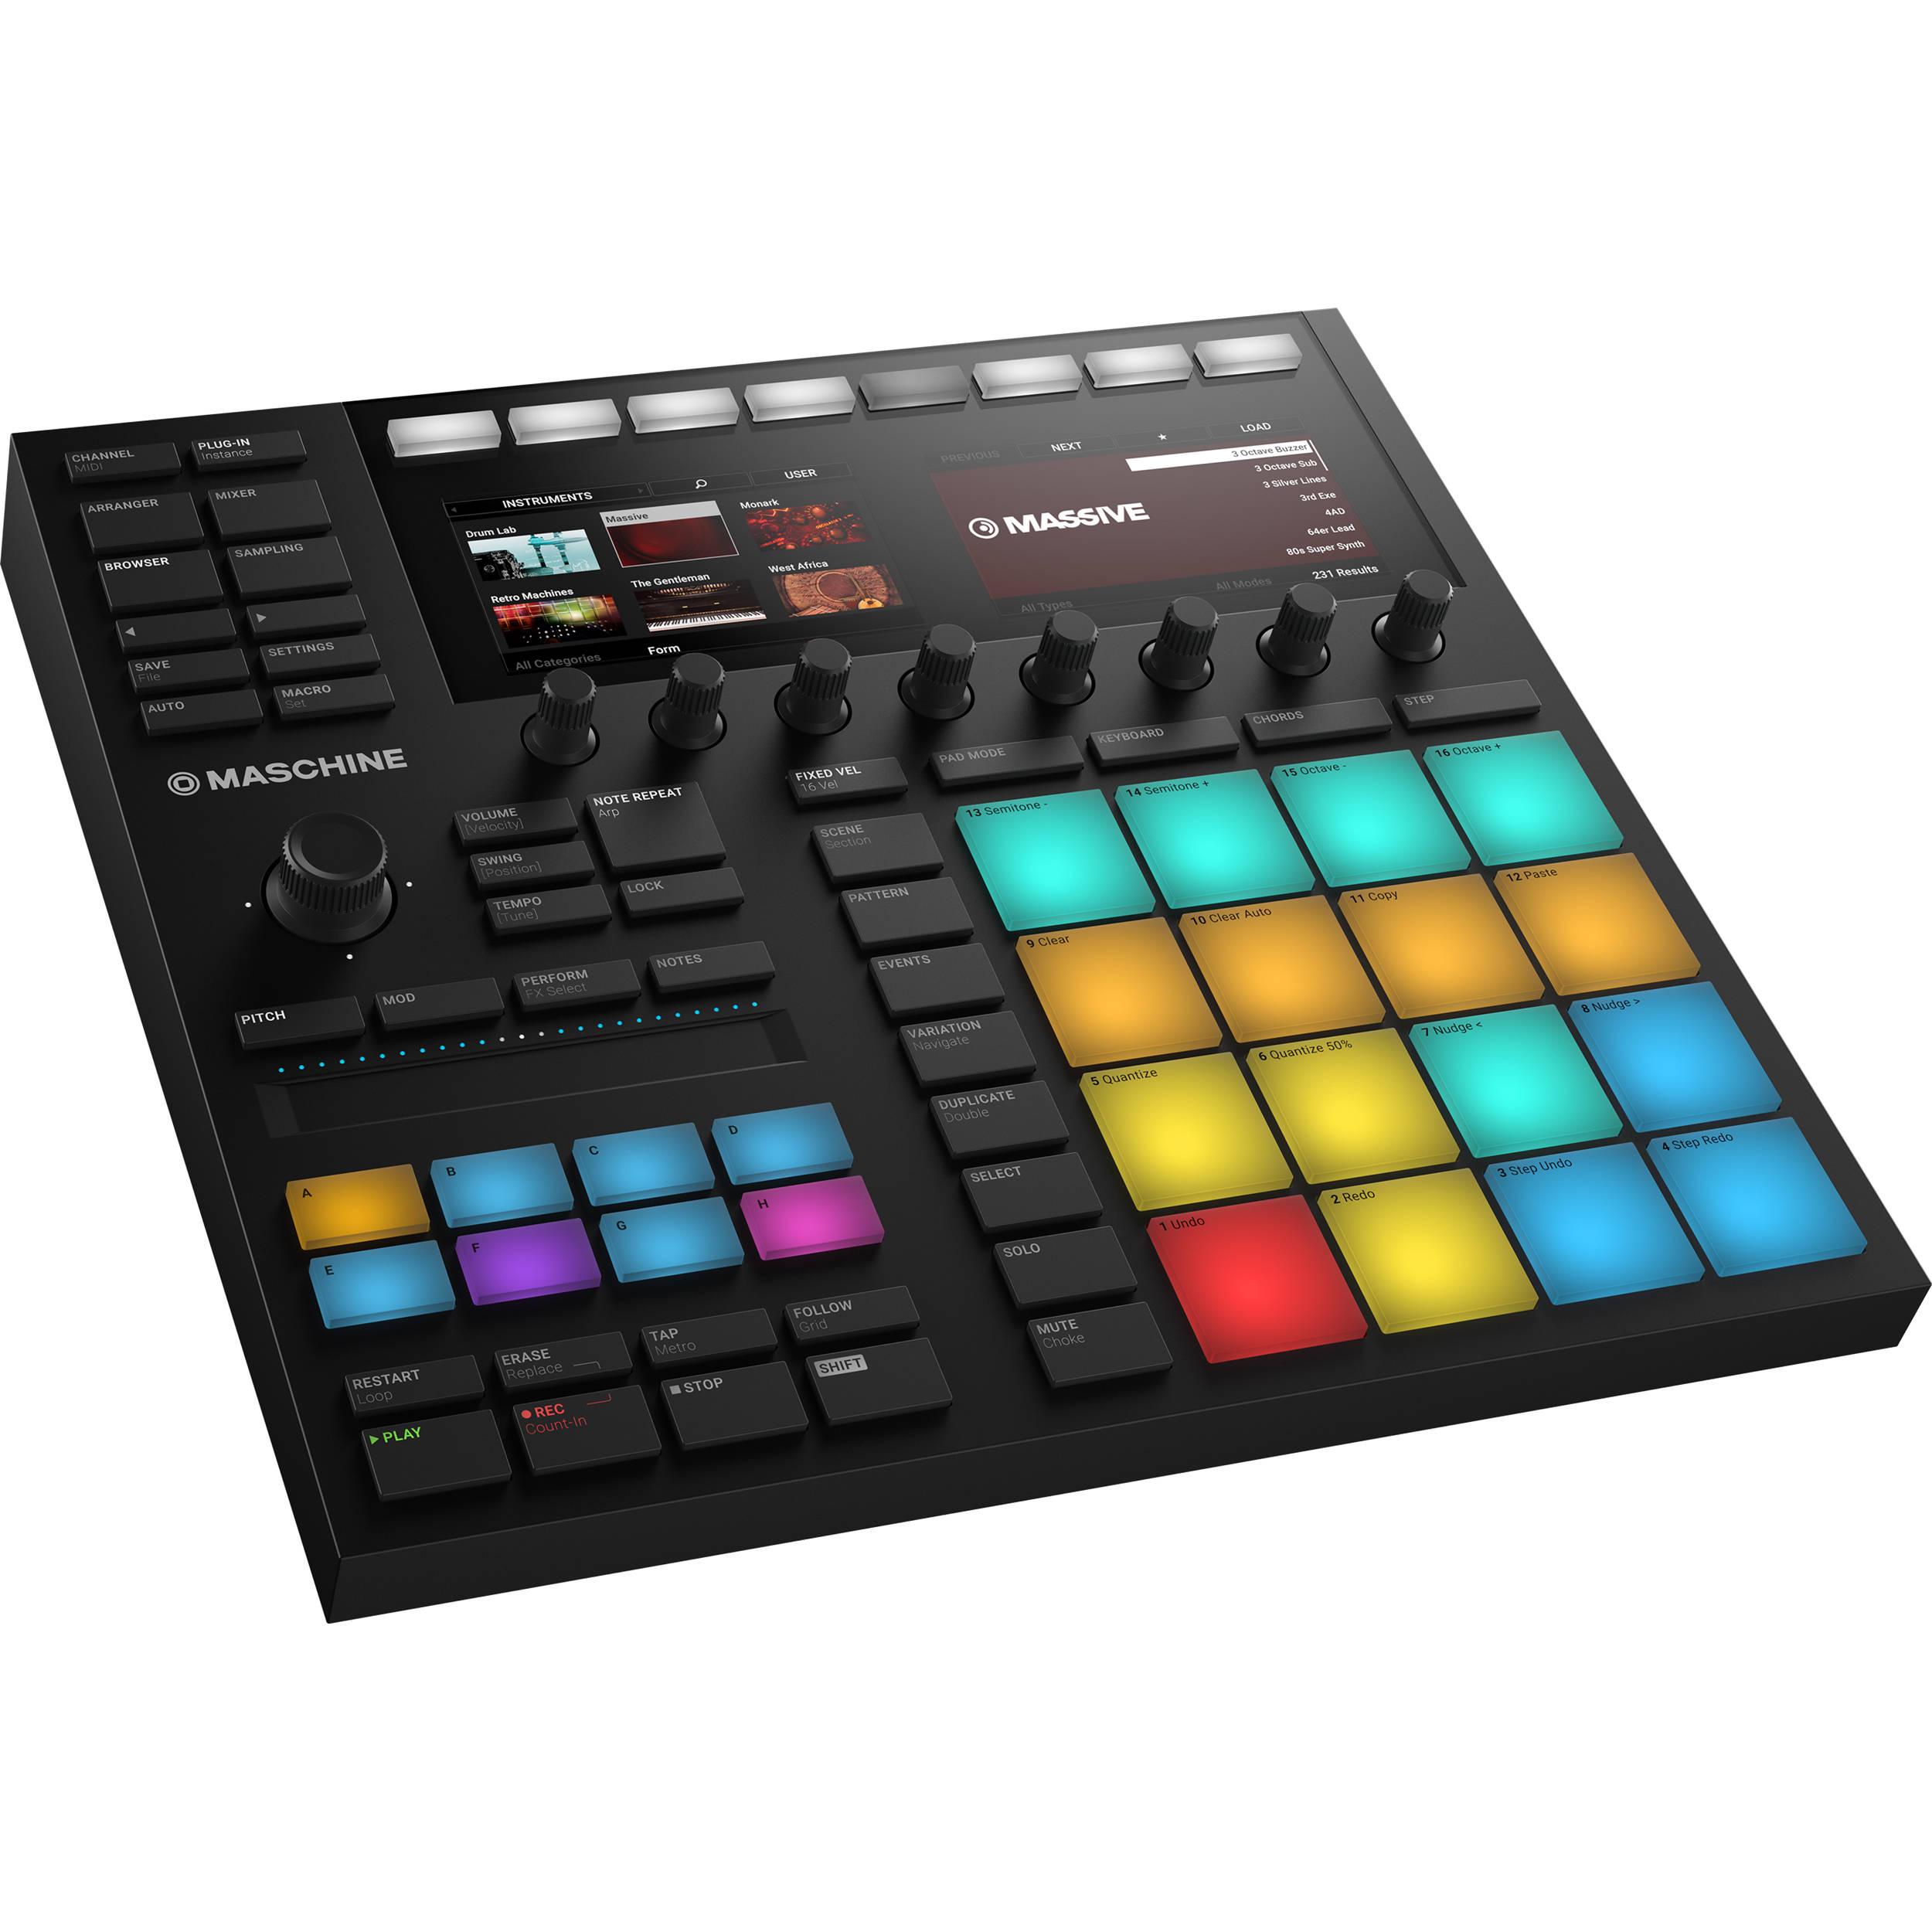 Native Instruments MASCHINE MK3 - Groove Production Studio (Black)